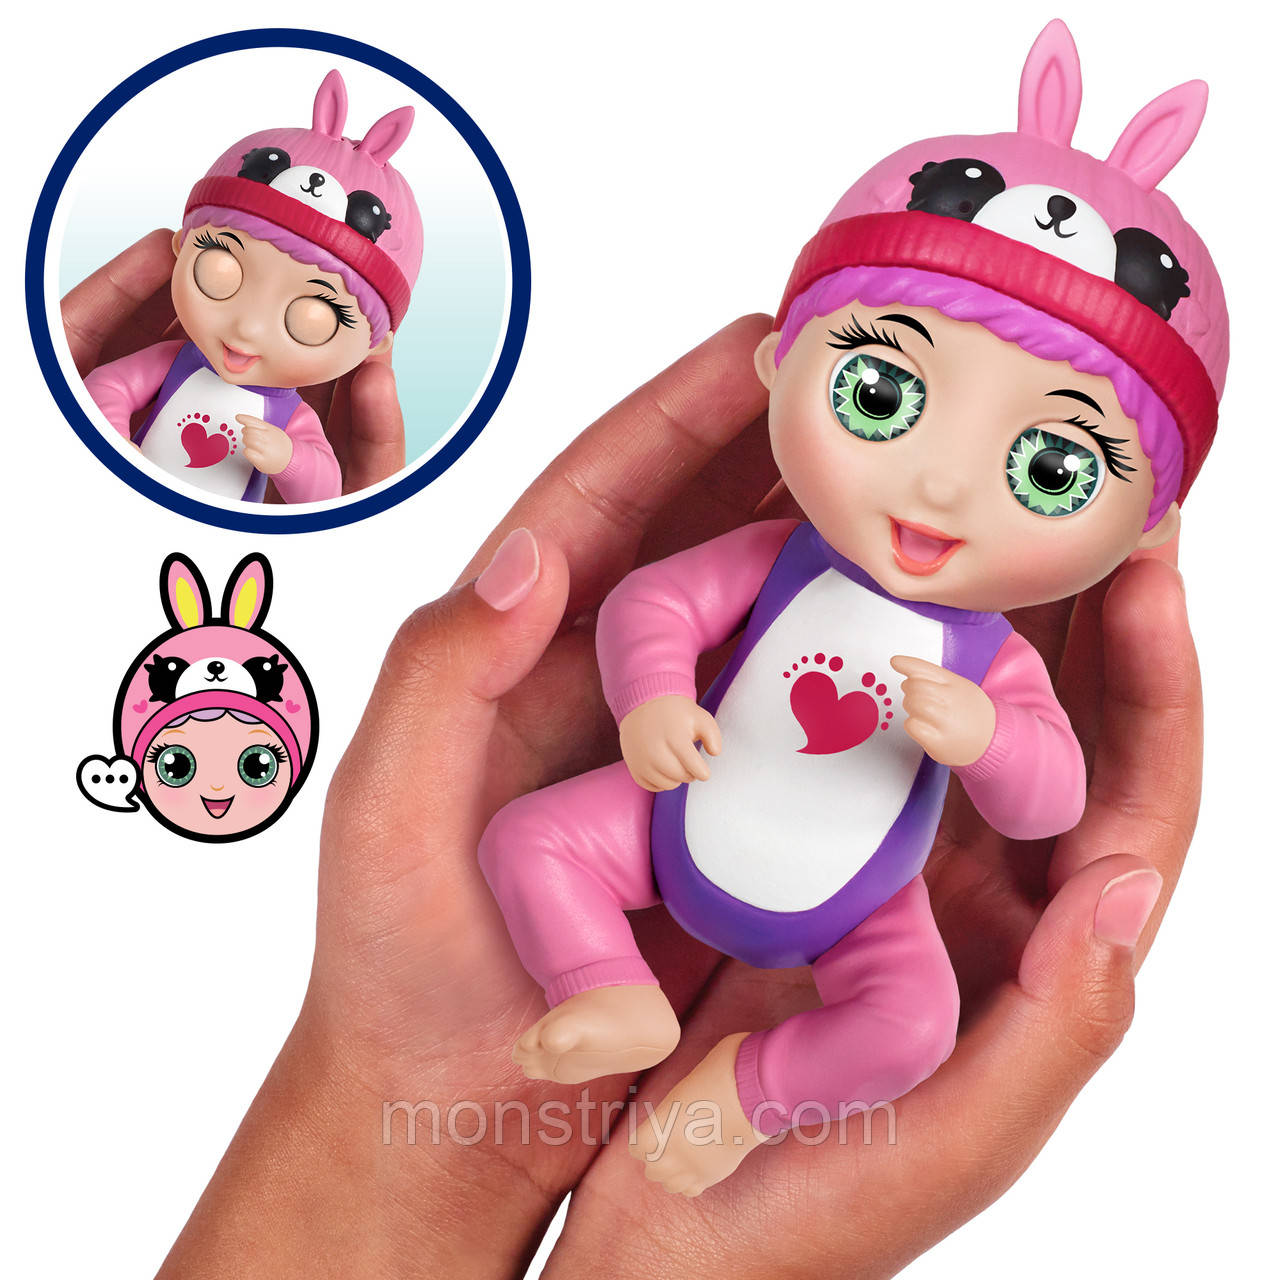 Интерактивная кукла-пупс Тини Тойс/ Tiny Toes Ticklish Tess Фингерлингс